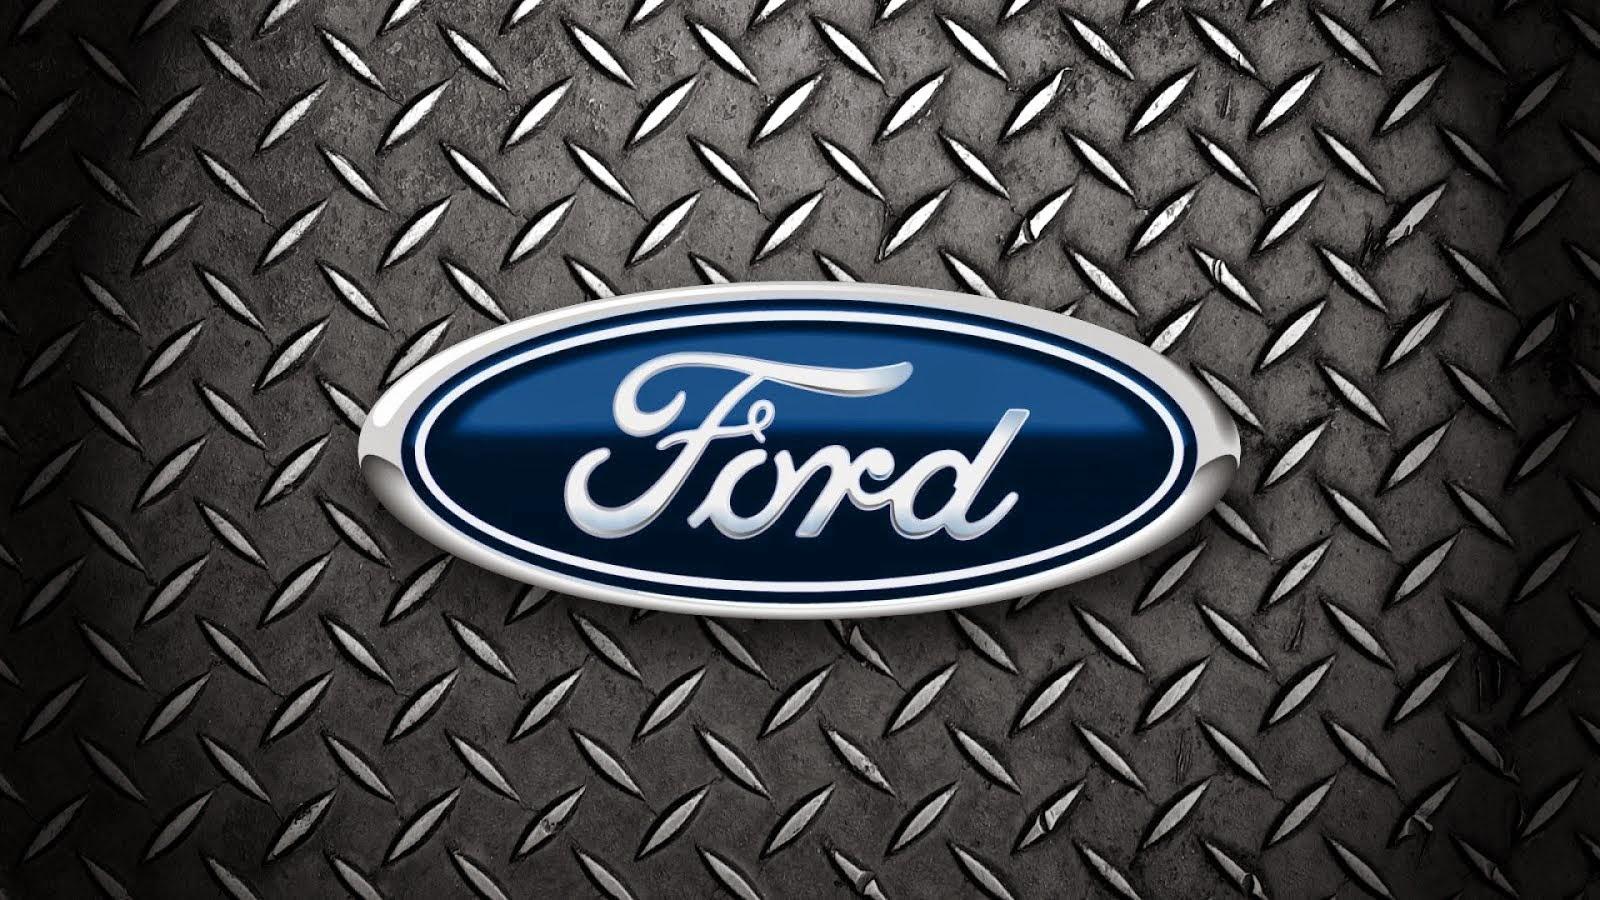 Built Ford Tough Wallpaper 1600x900